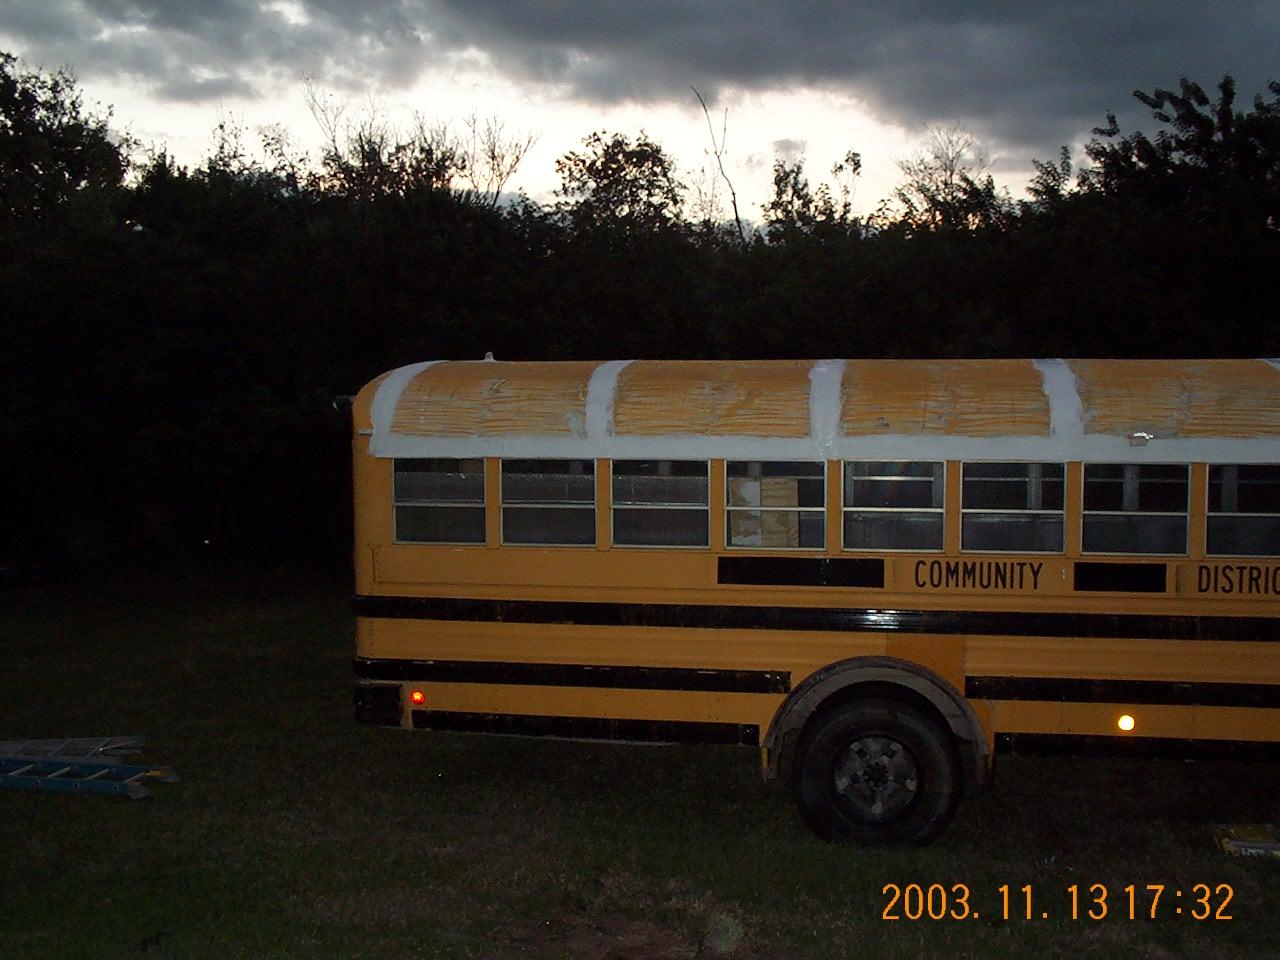 Bus 16Nov03 002